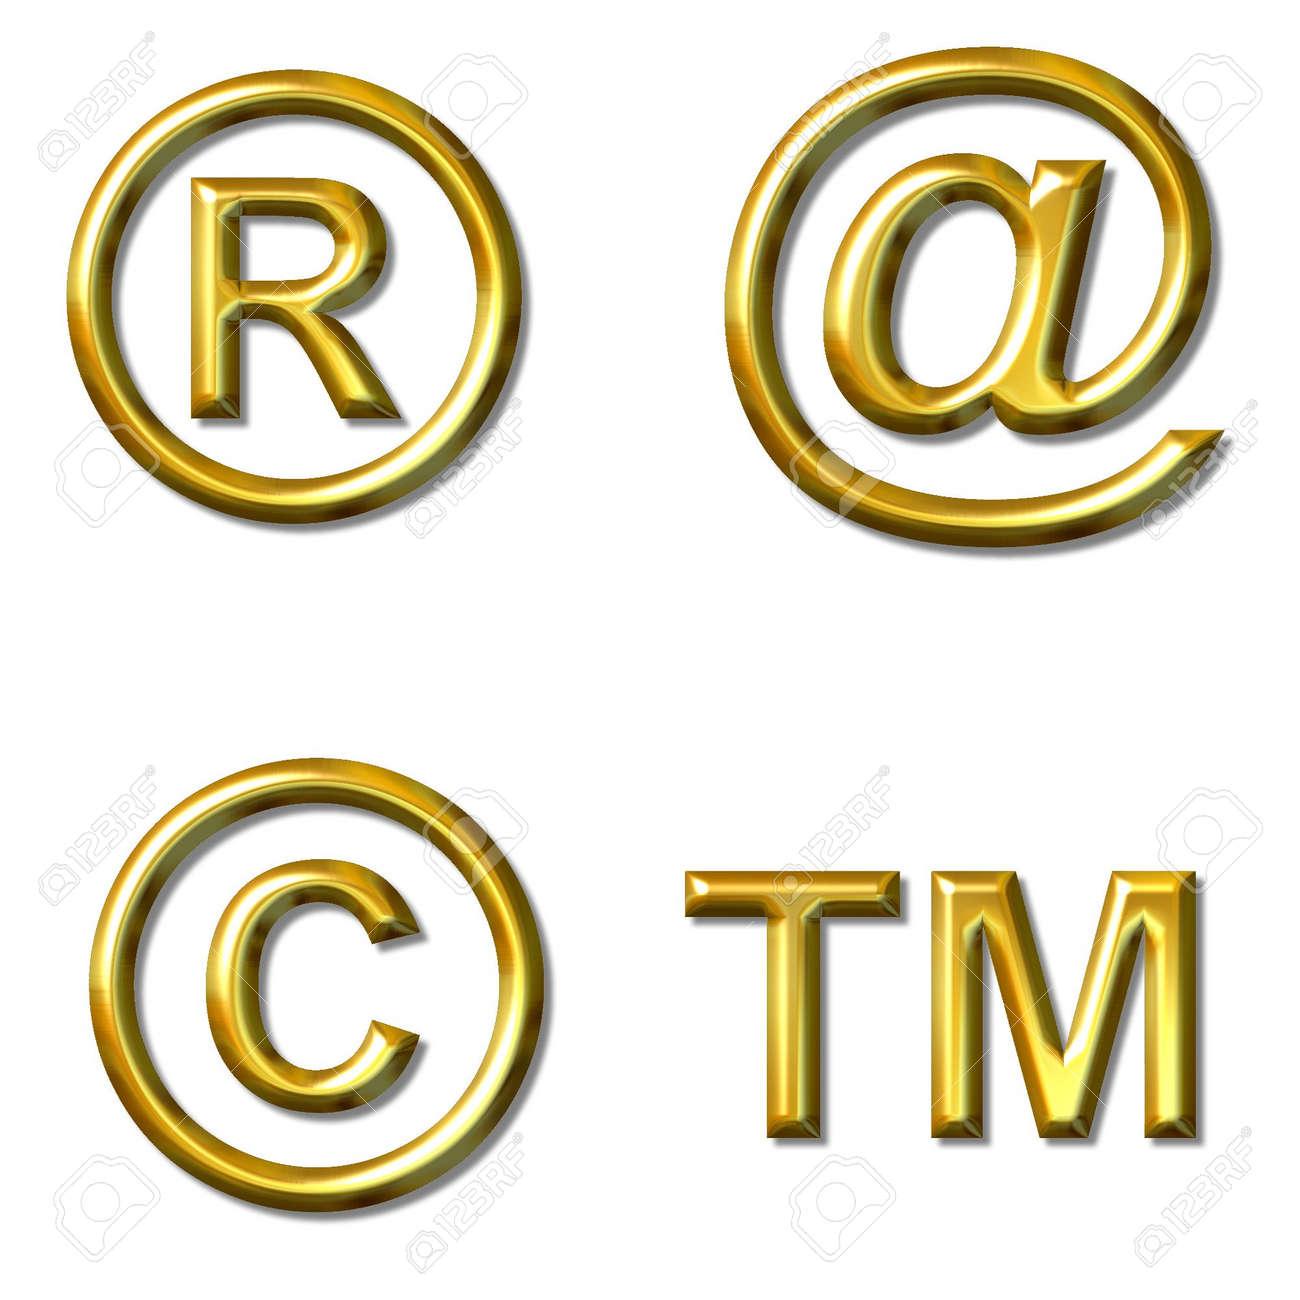 Symbols Copyright Tm Registered Trade Mark 4 In 1 Stock Photo